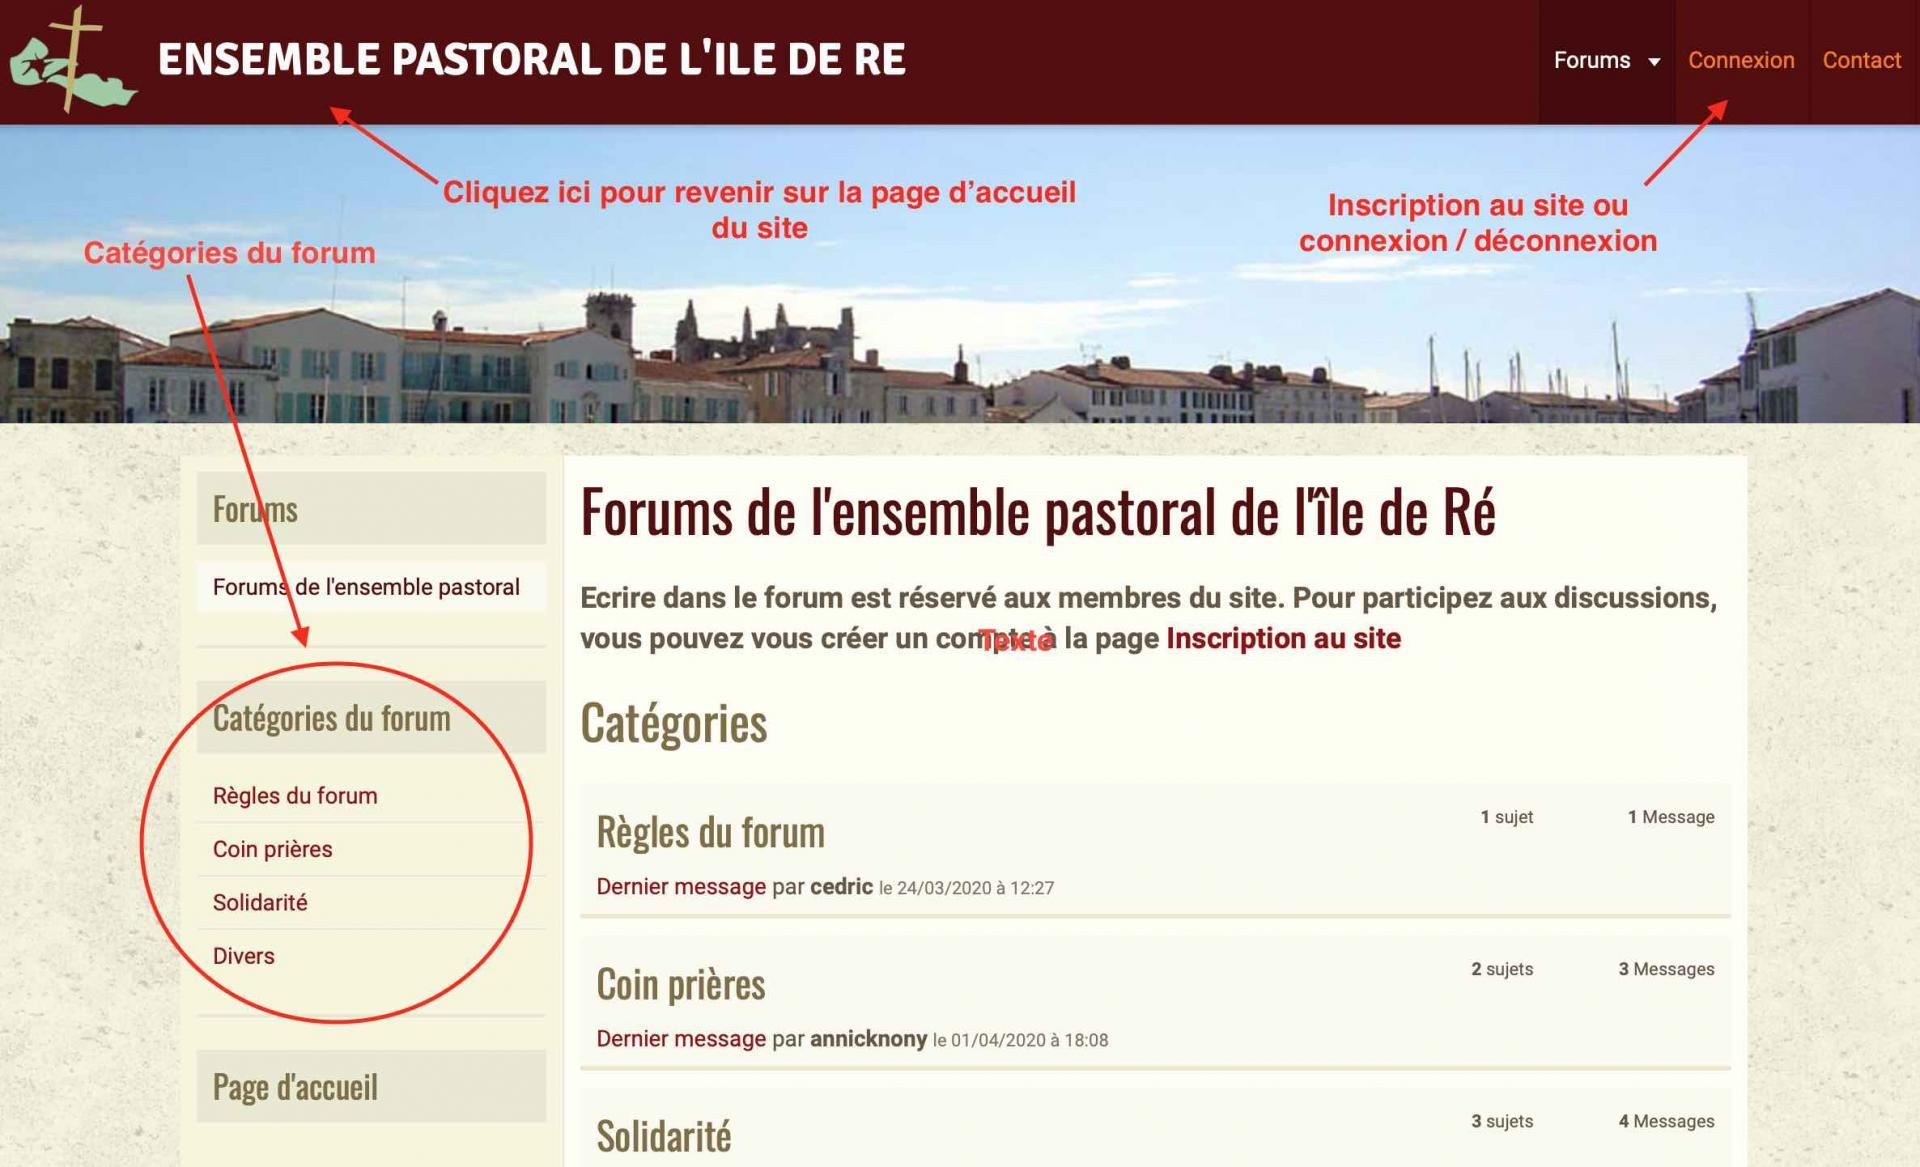 http://www.iledereparoisses.fr/medias/images/menus-forums.jpg